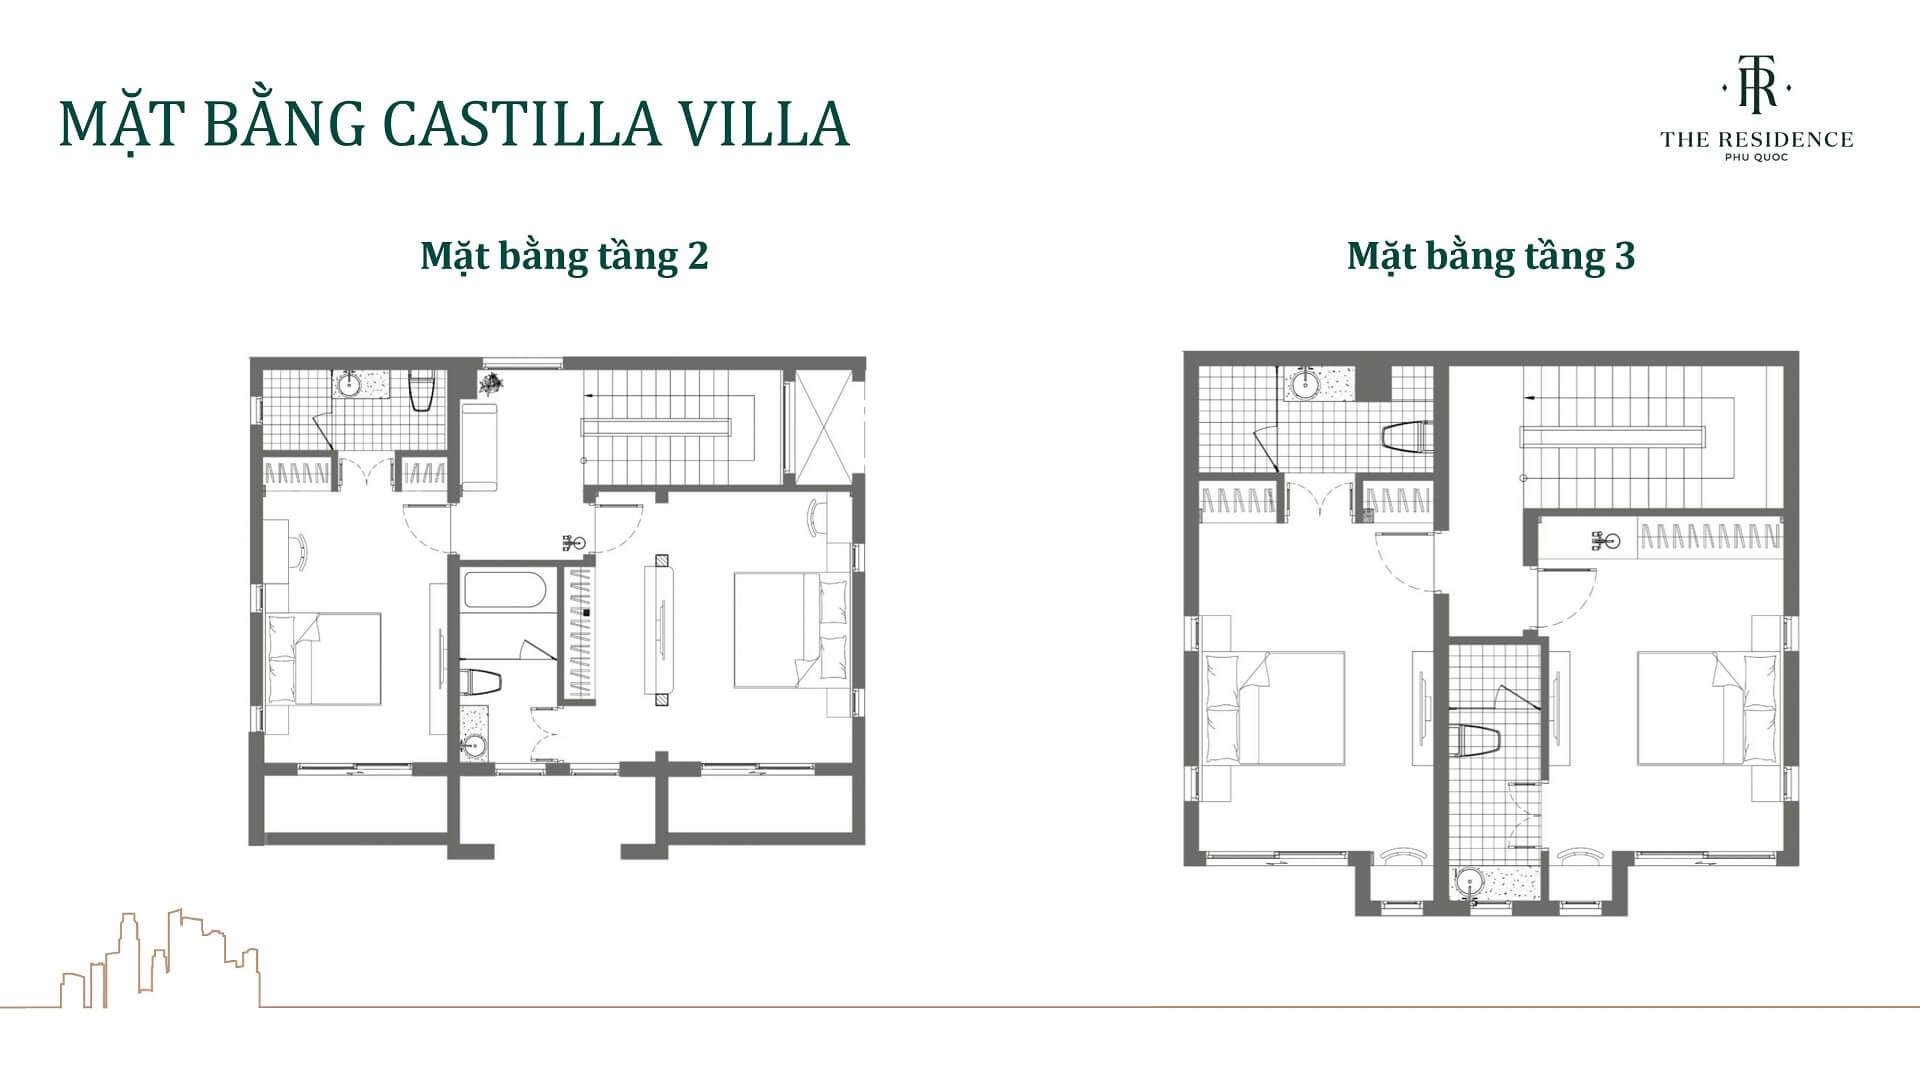 mặt bằng biệt thự castilla